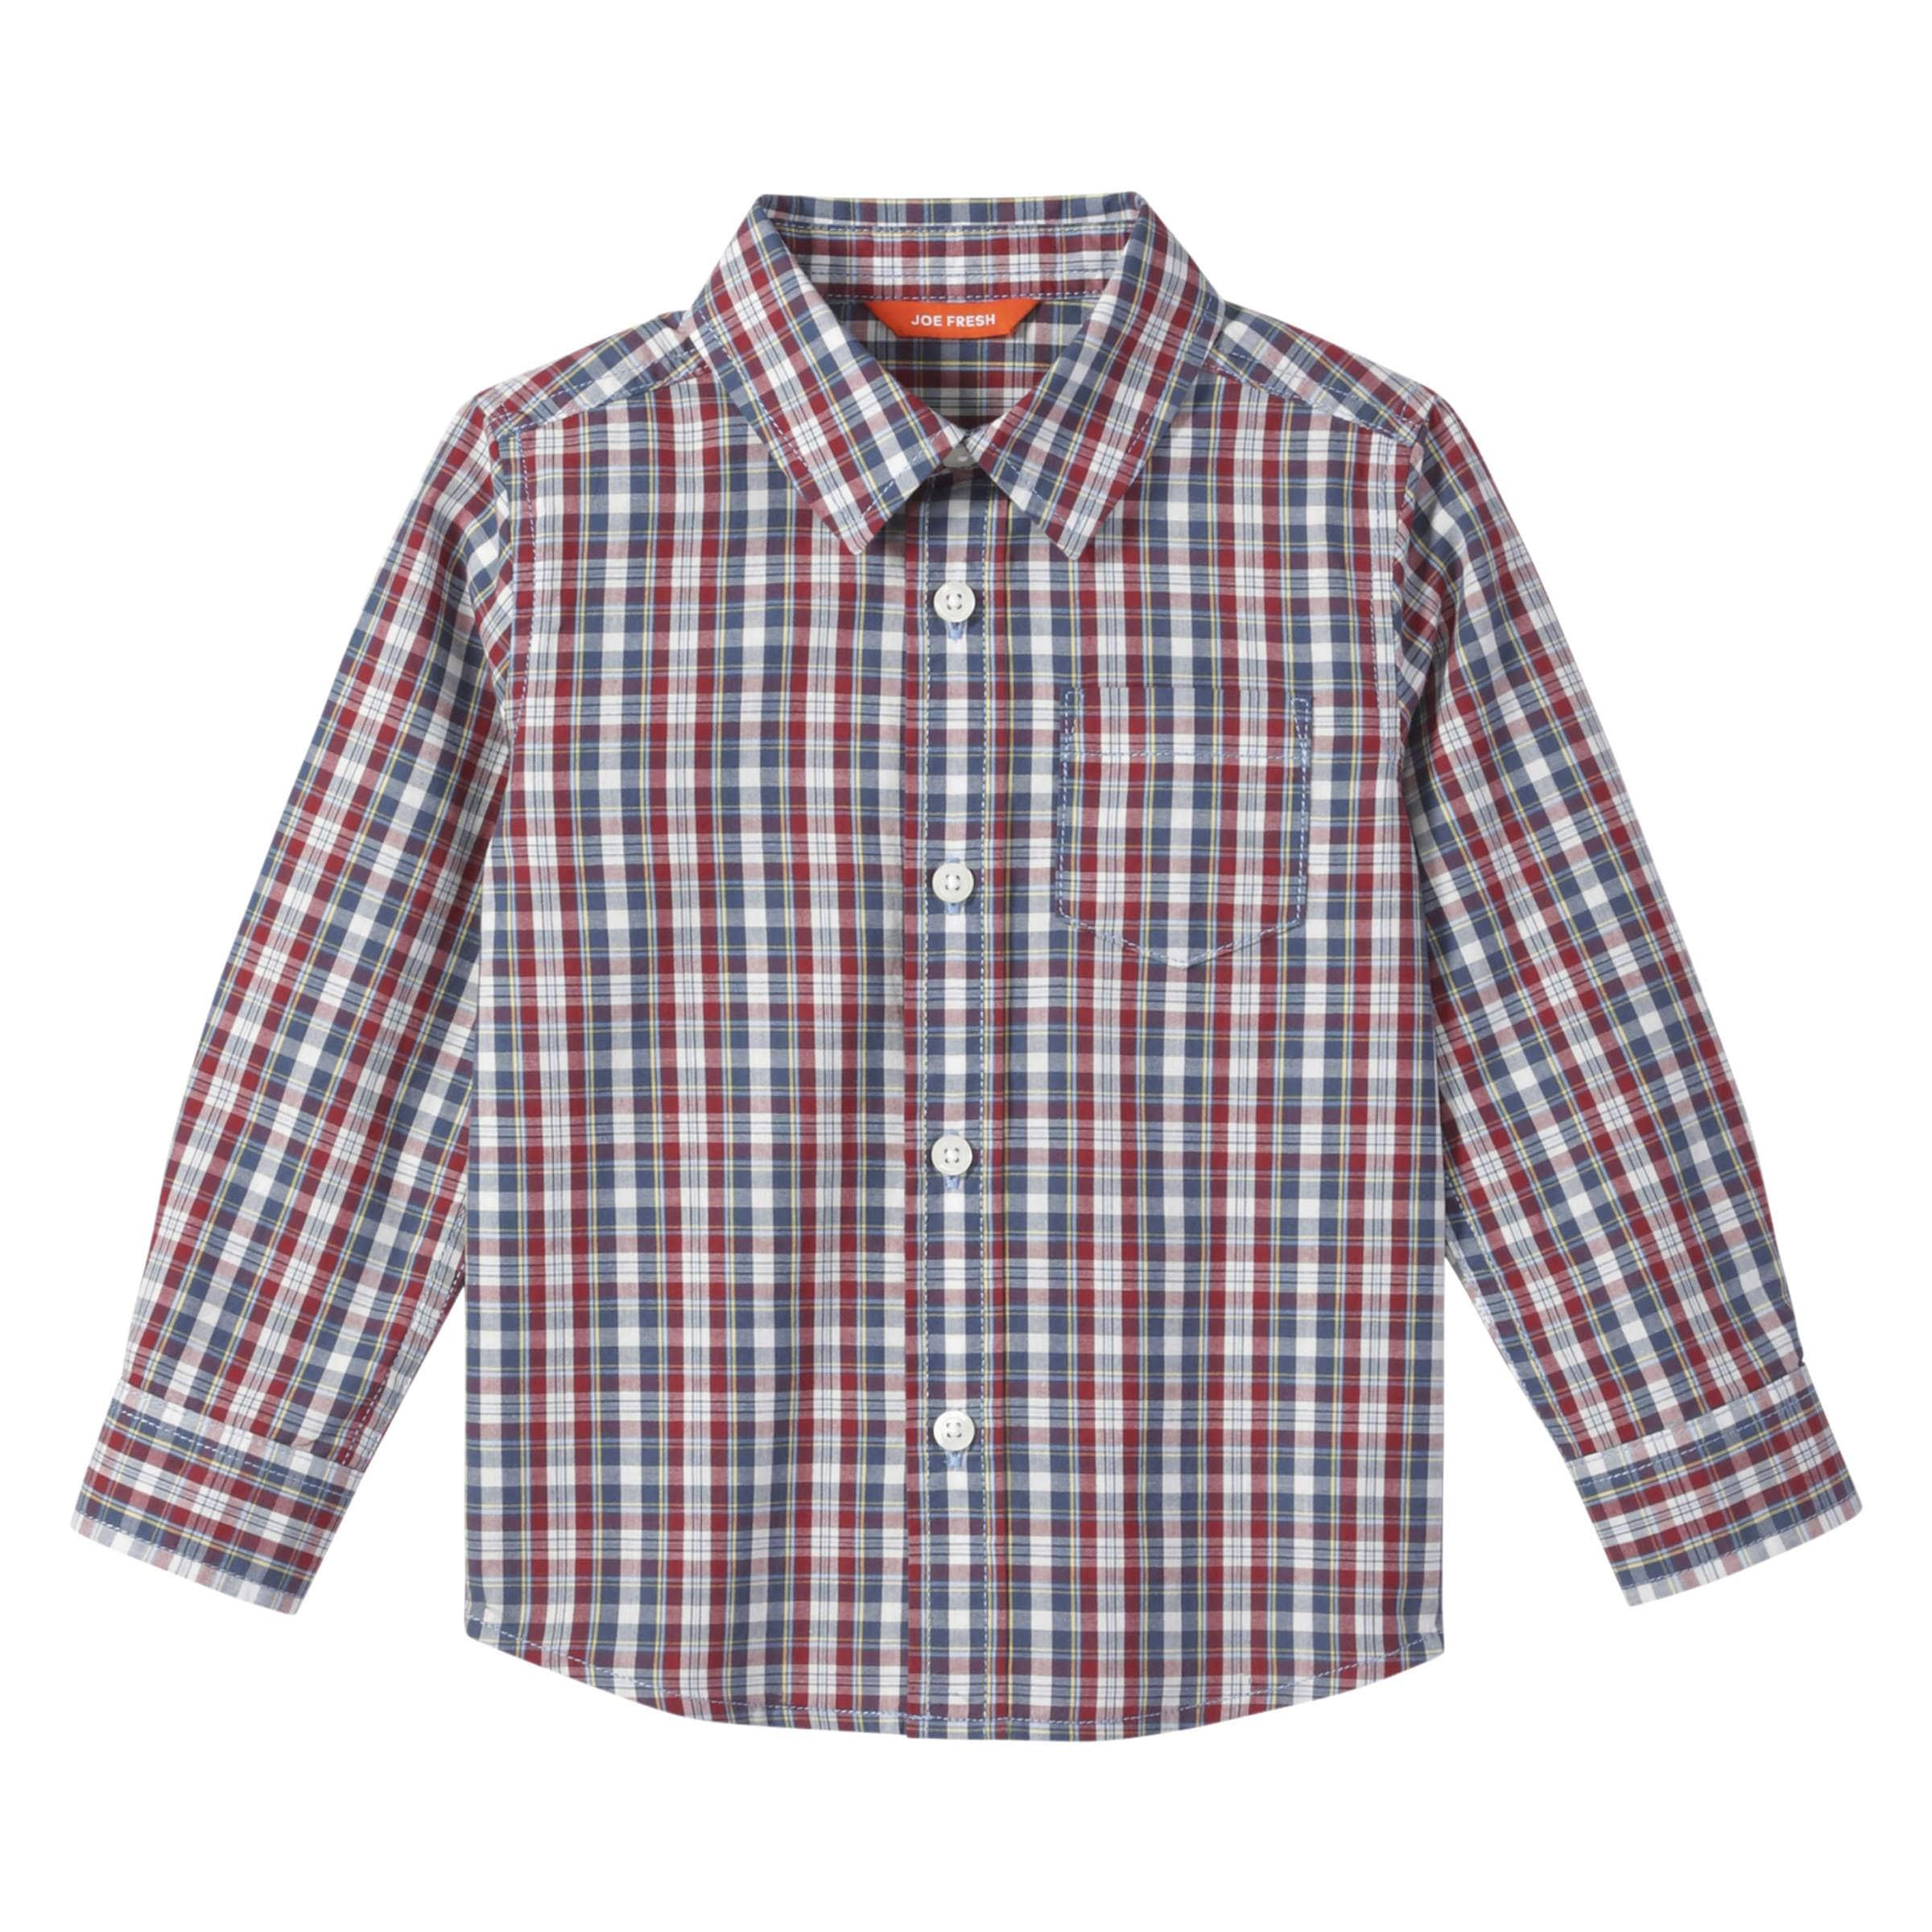 a2129c2db Toddler Boys' Plaid Shirt in Denim Blue from Joe Fresh